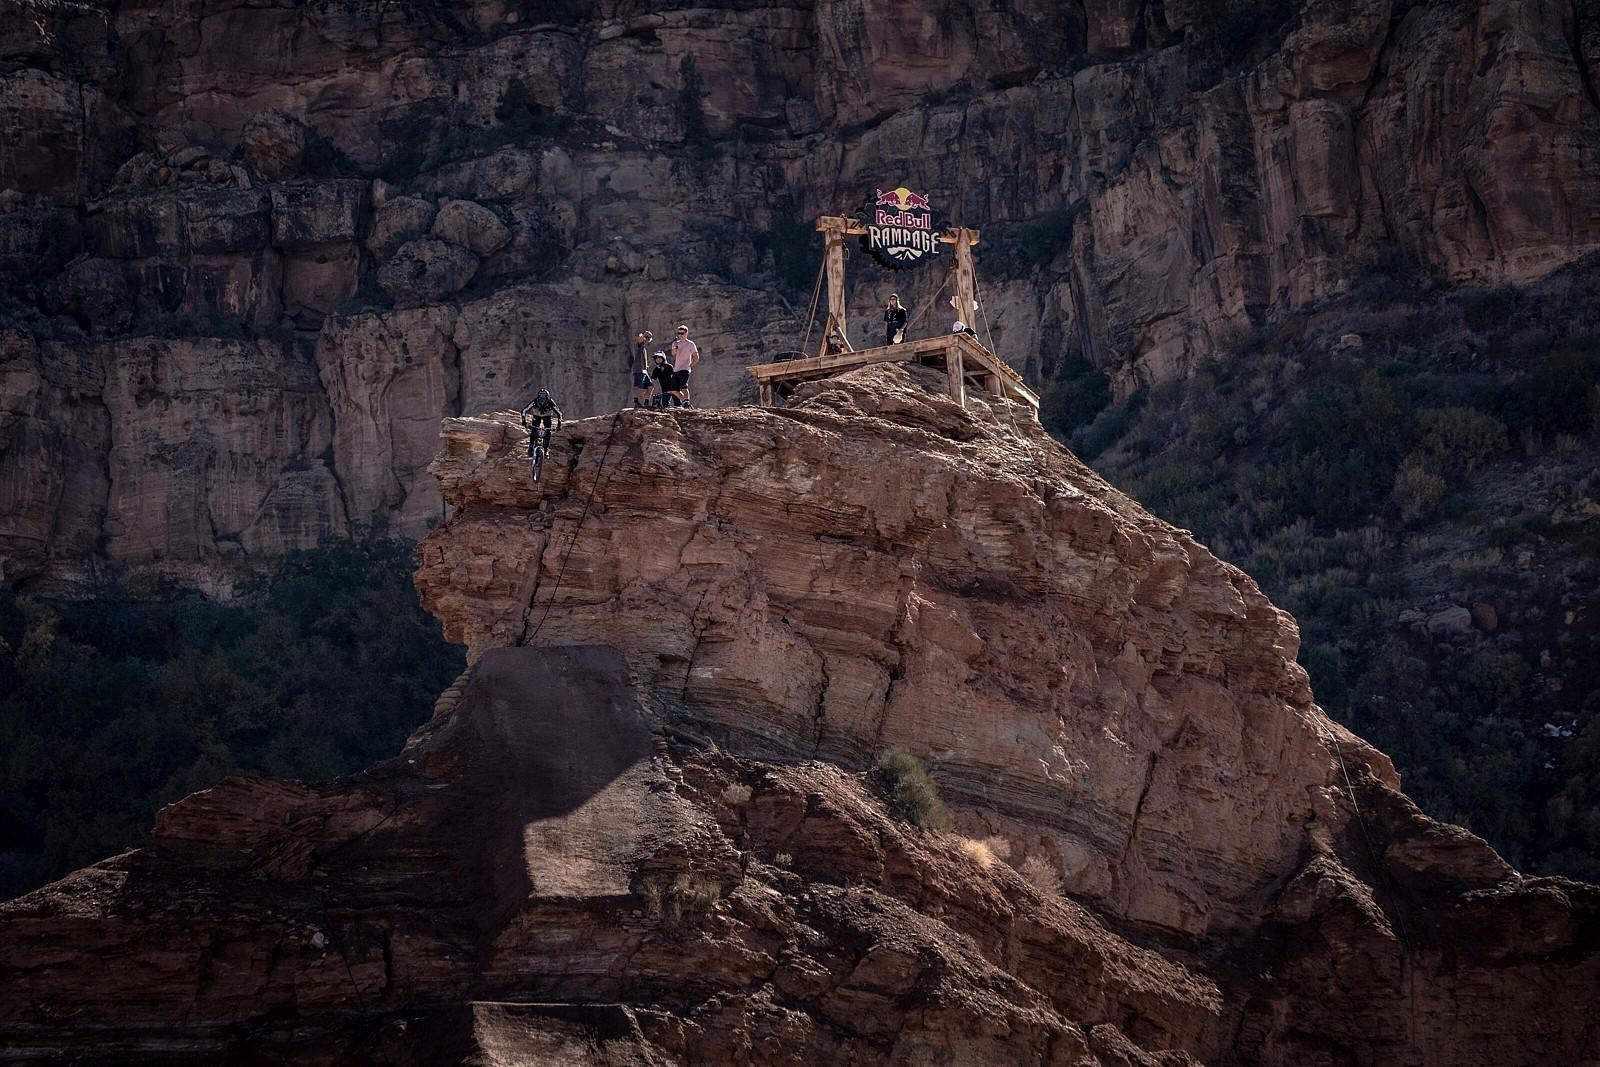 Tyler McCaul - 2021 Red Bull Rampage Photos - Mountain Biking Pictures - Vital MTB